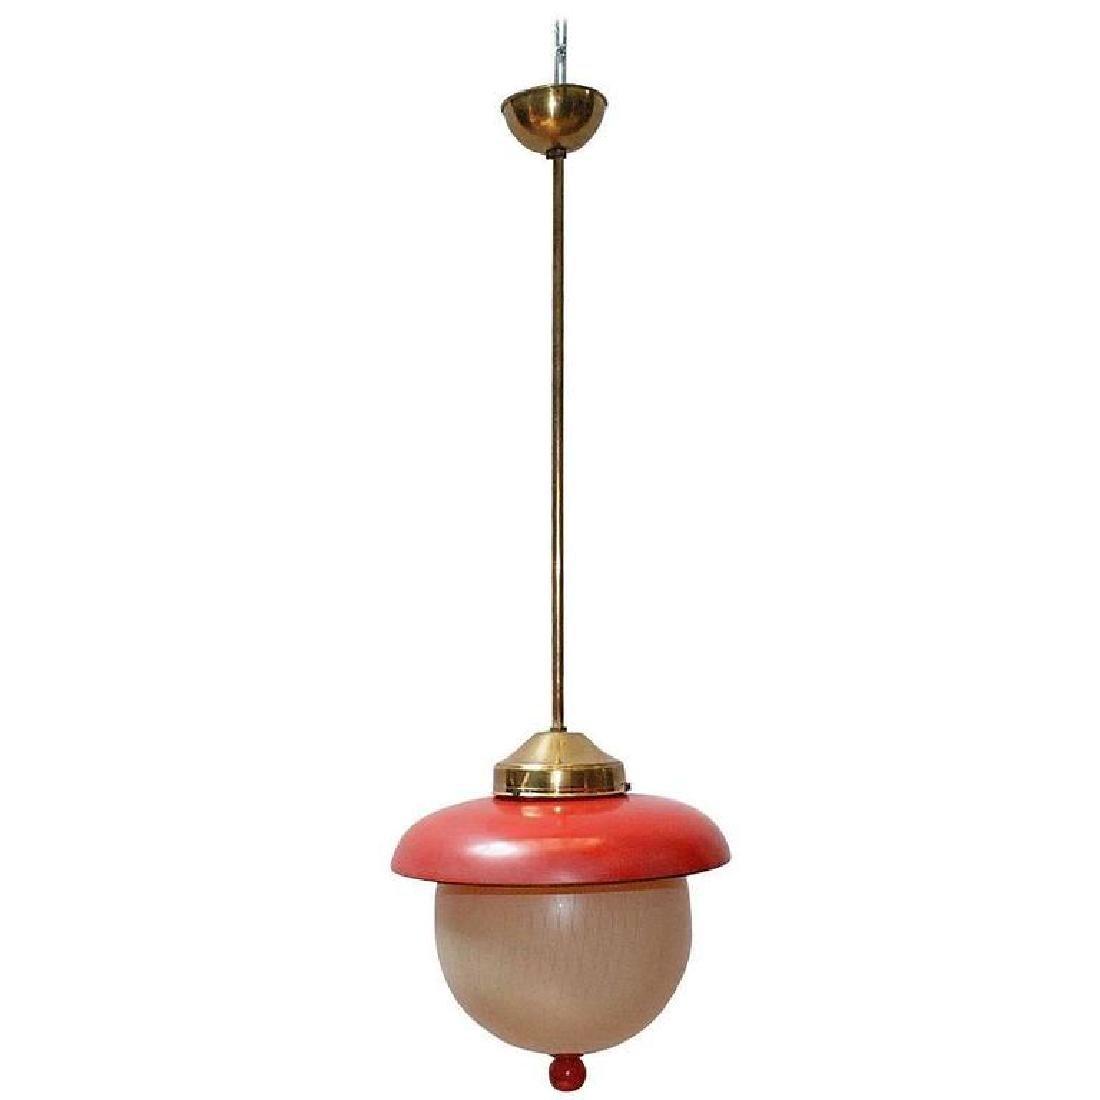 Italian Red and Cream Glass Pendant by Stilnovo